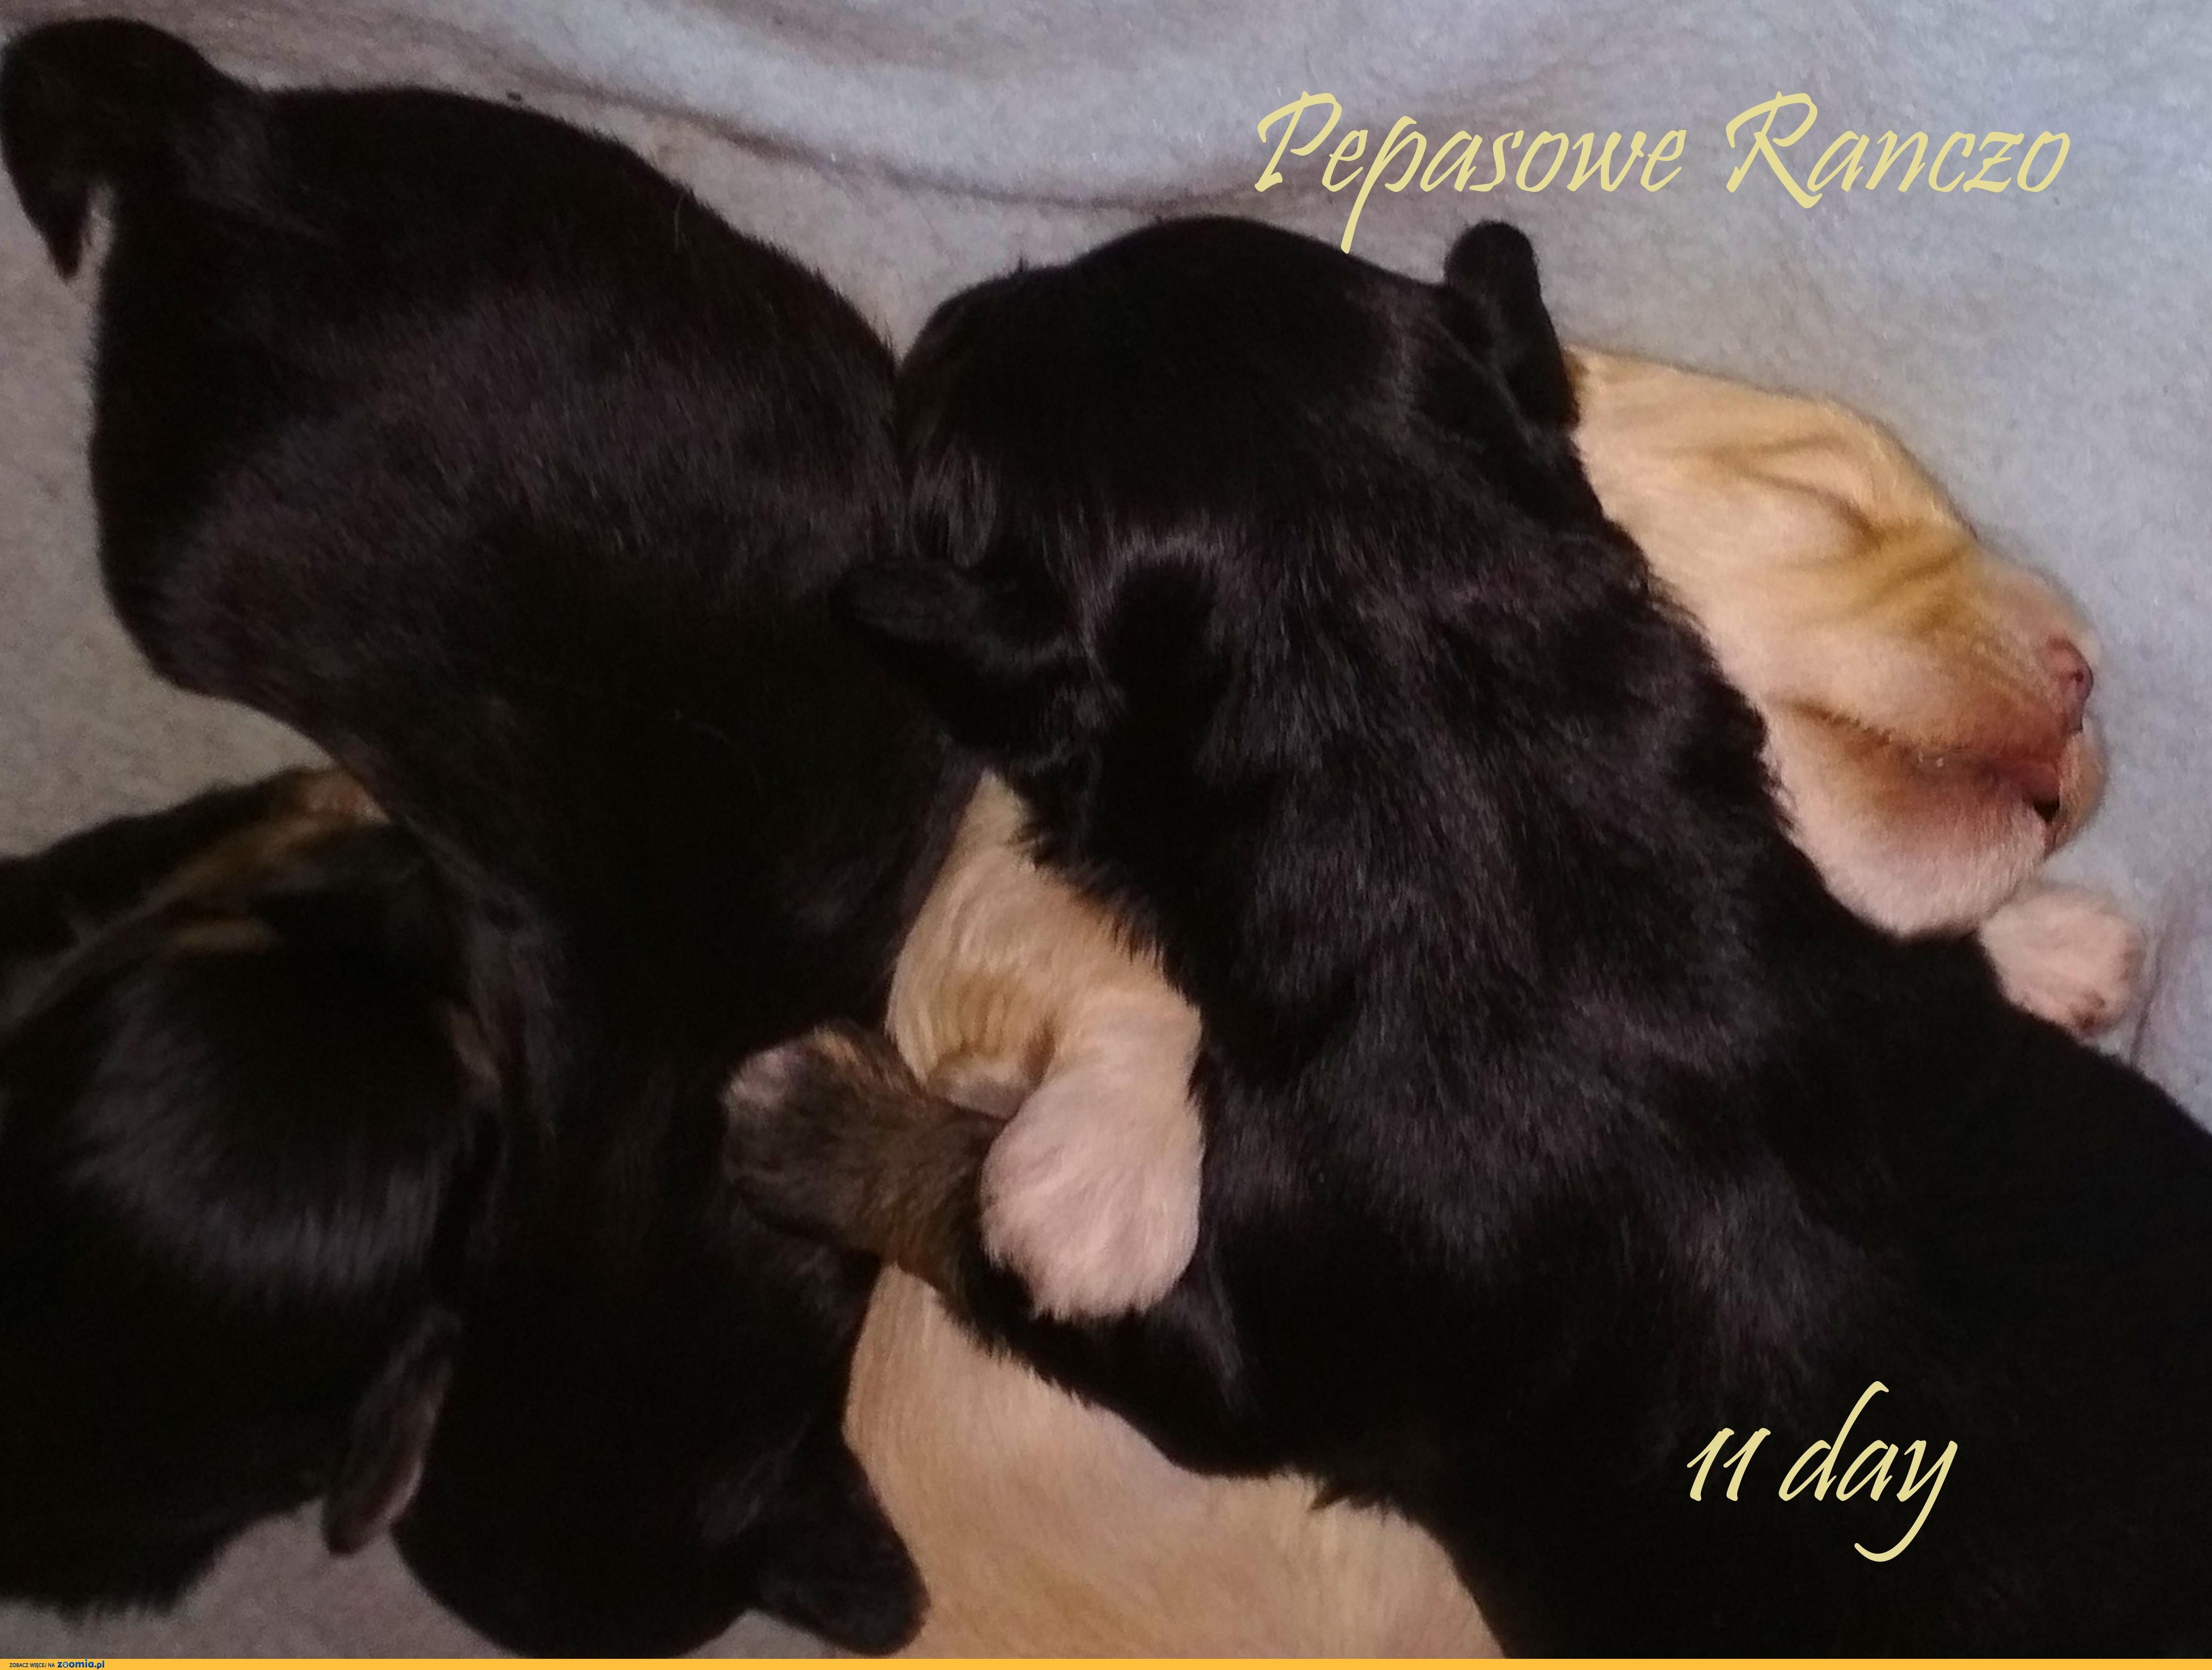 szczeniak pies Hawańczyk nie Chihuahua york Coton Gryfon Lhasa maltańczyk toy papilon bichon shih trrier